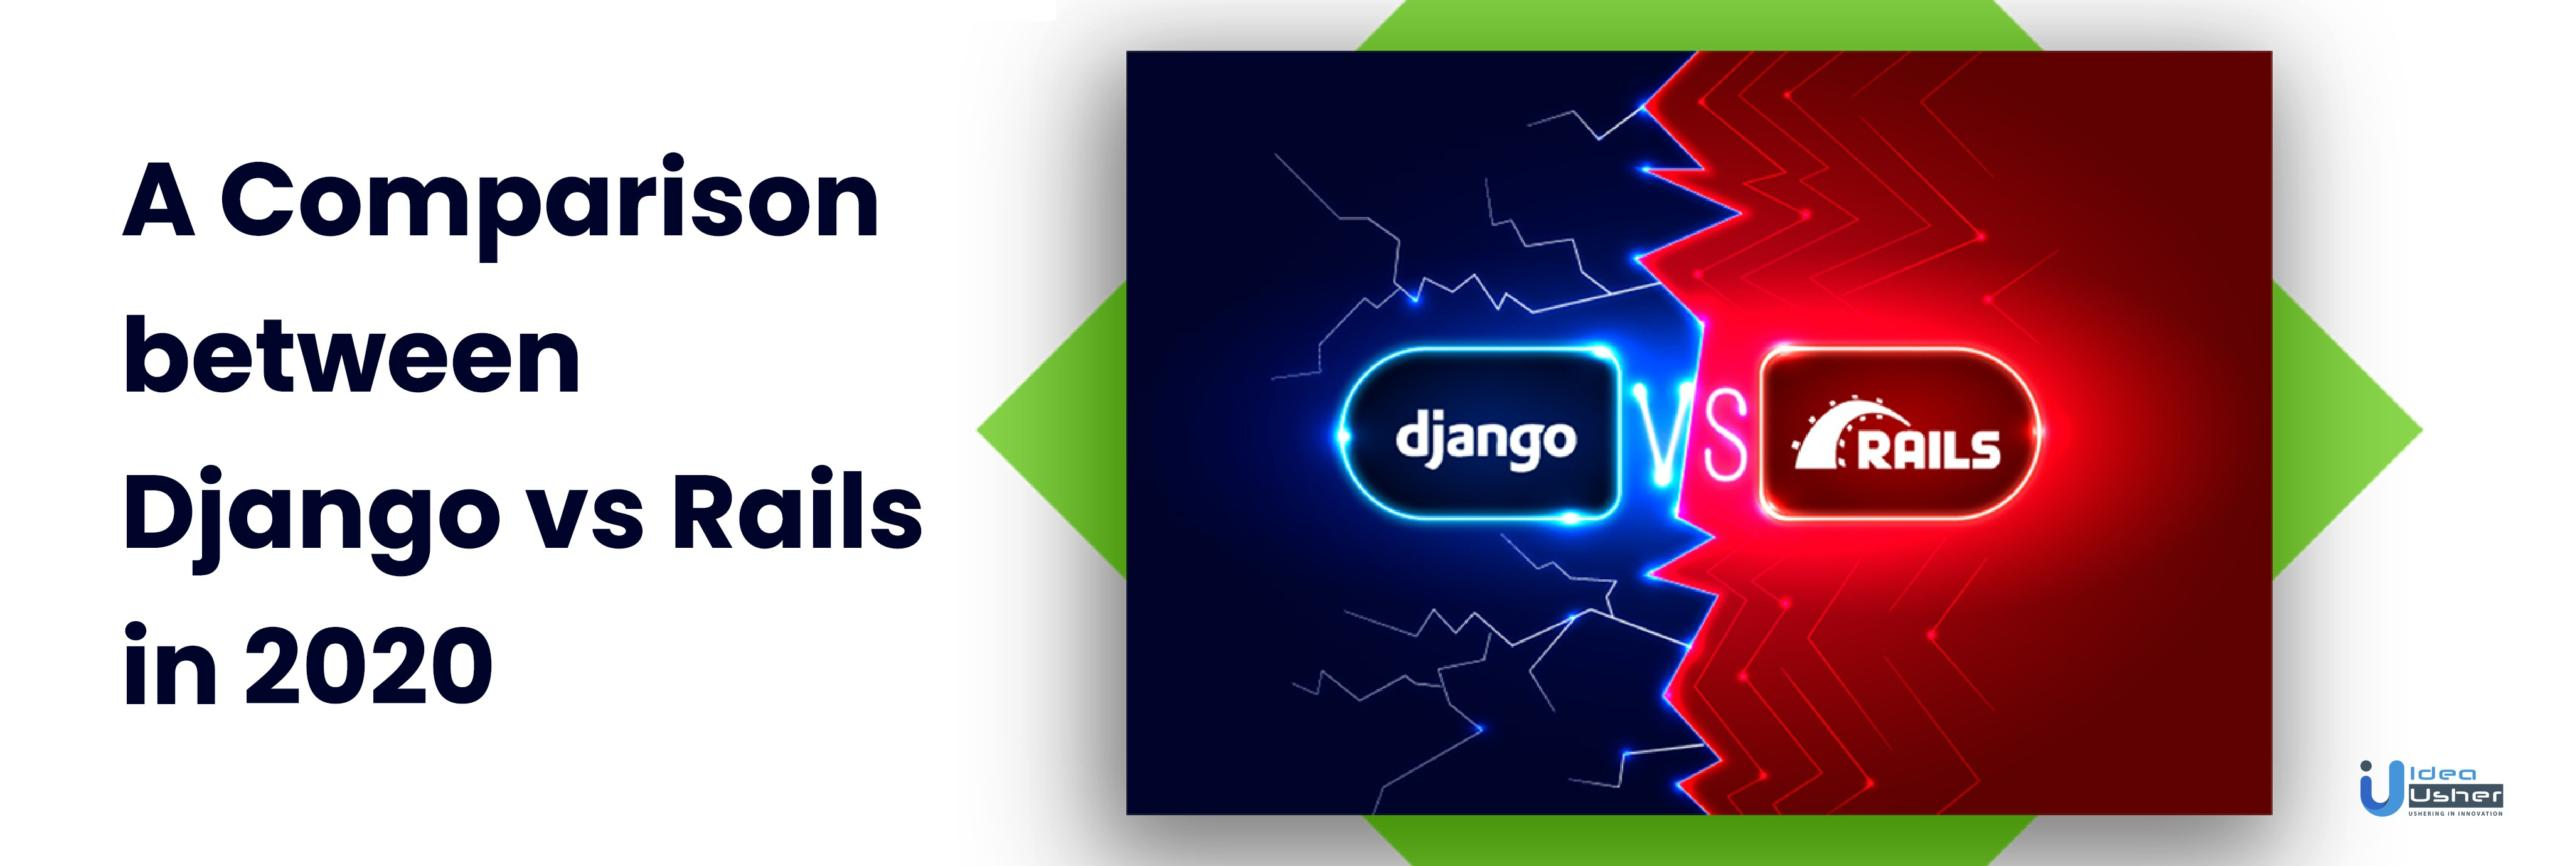 django vs rails comparison